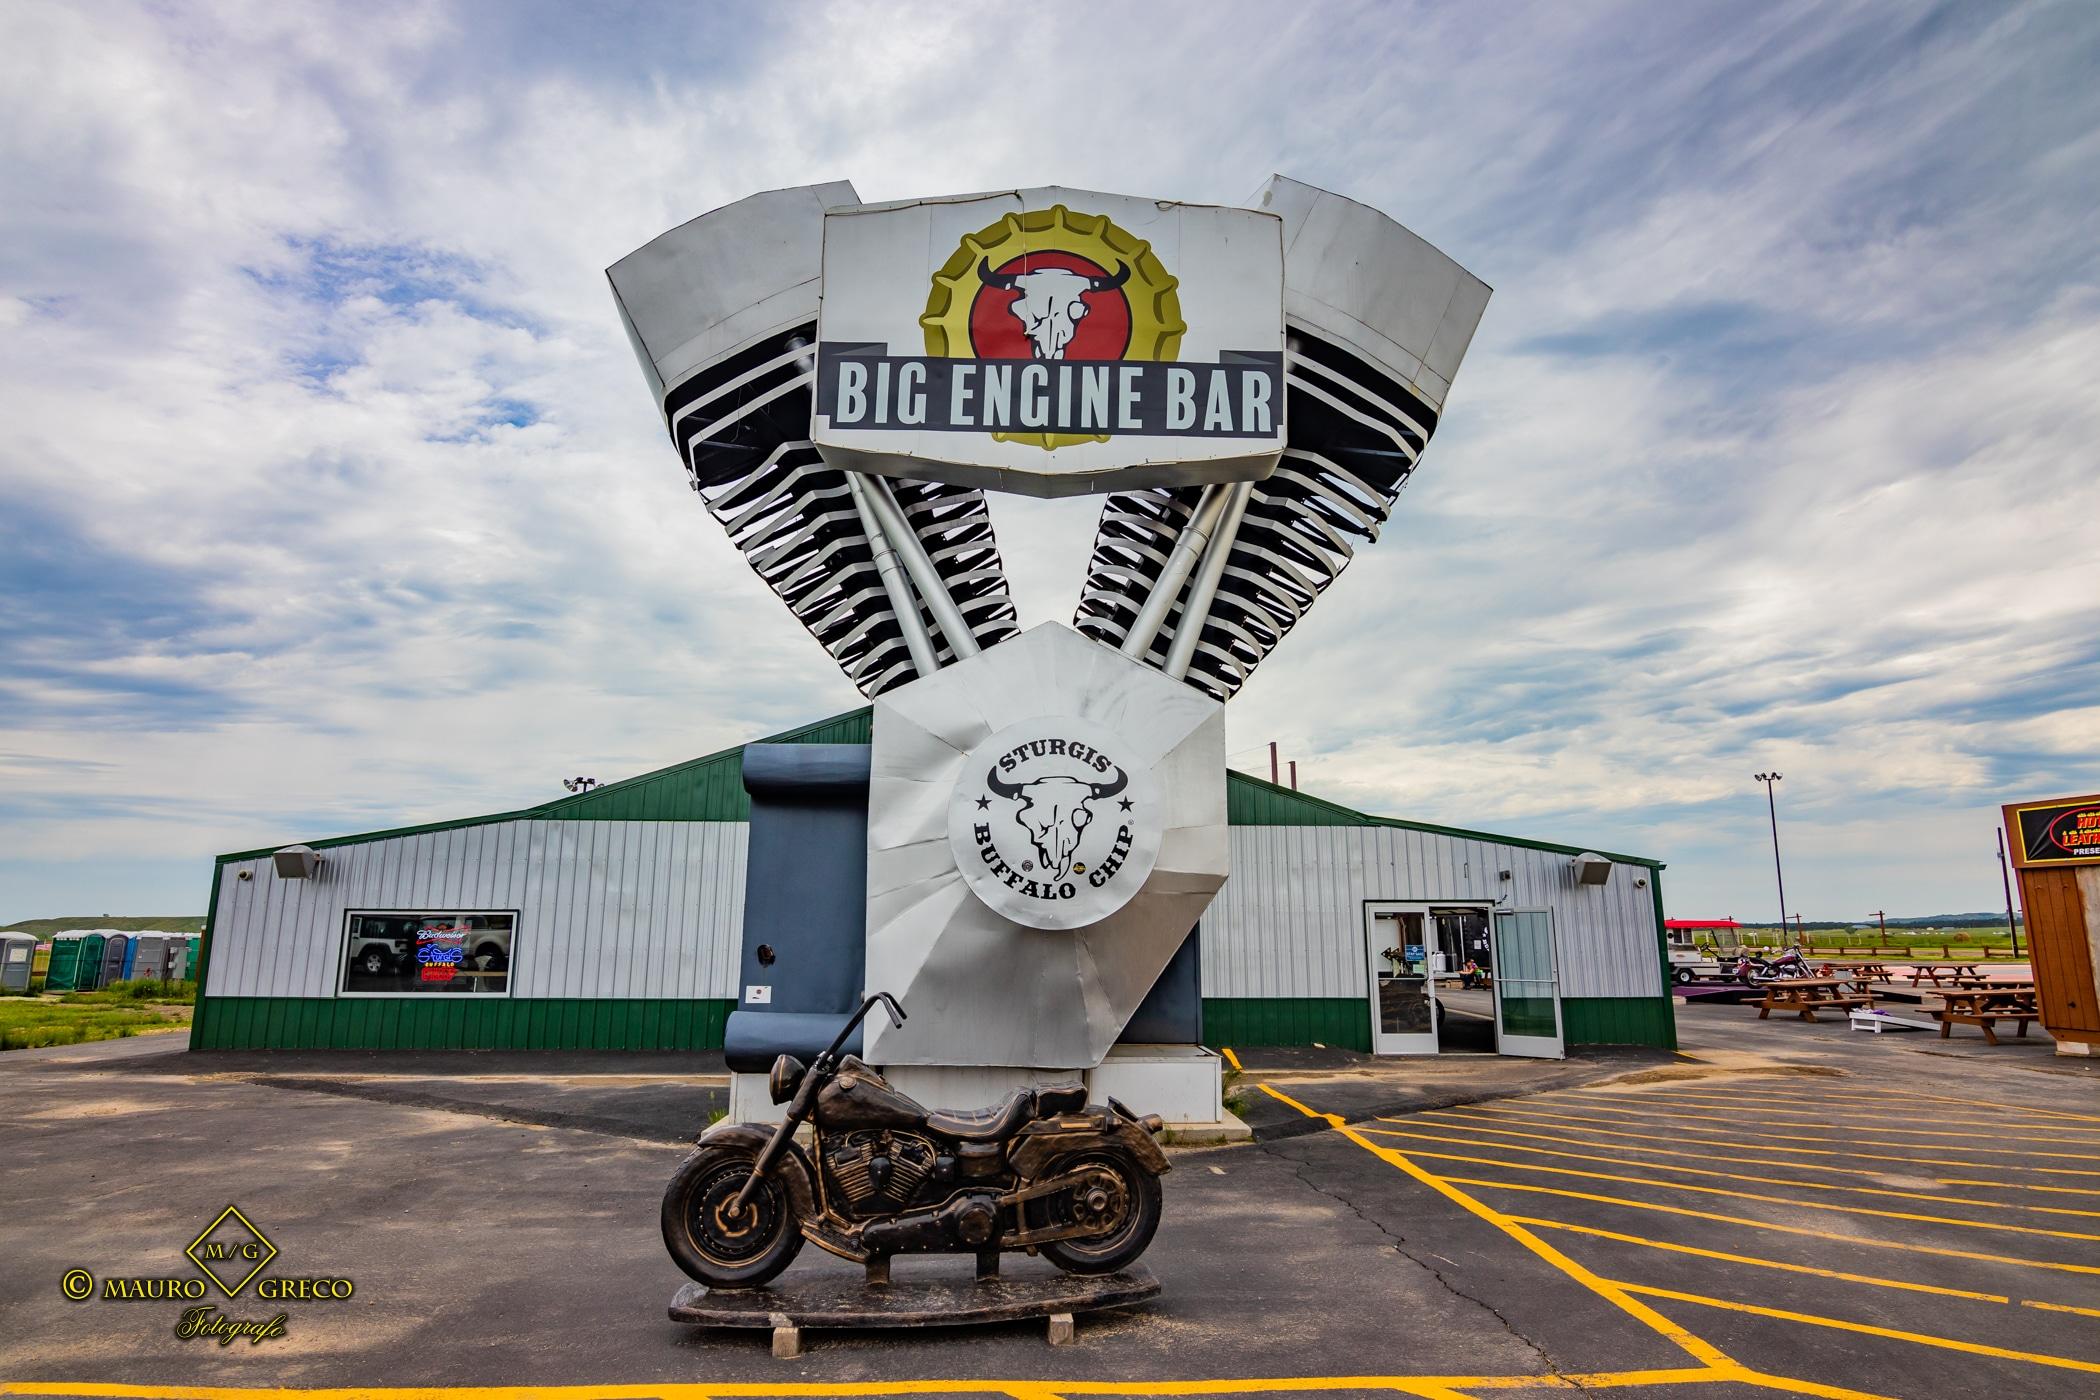 Sturgis South Dakota 2020 Tornado Moto Tour Viaggi organizzati in moto negli USA Monument Valley